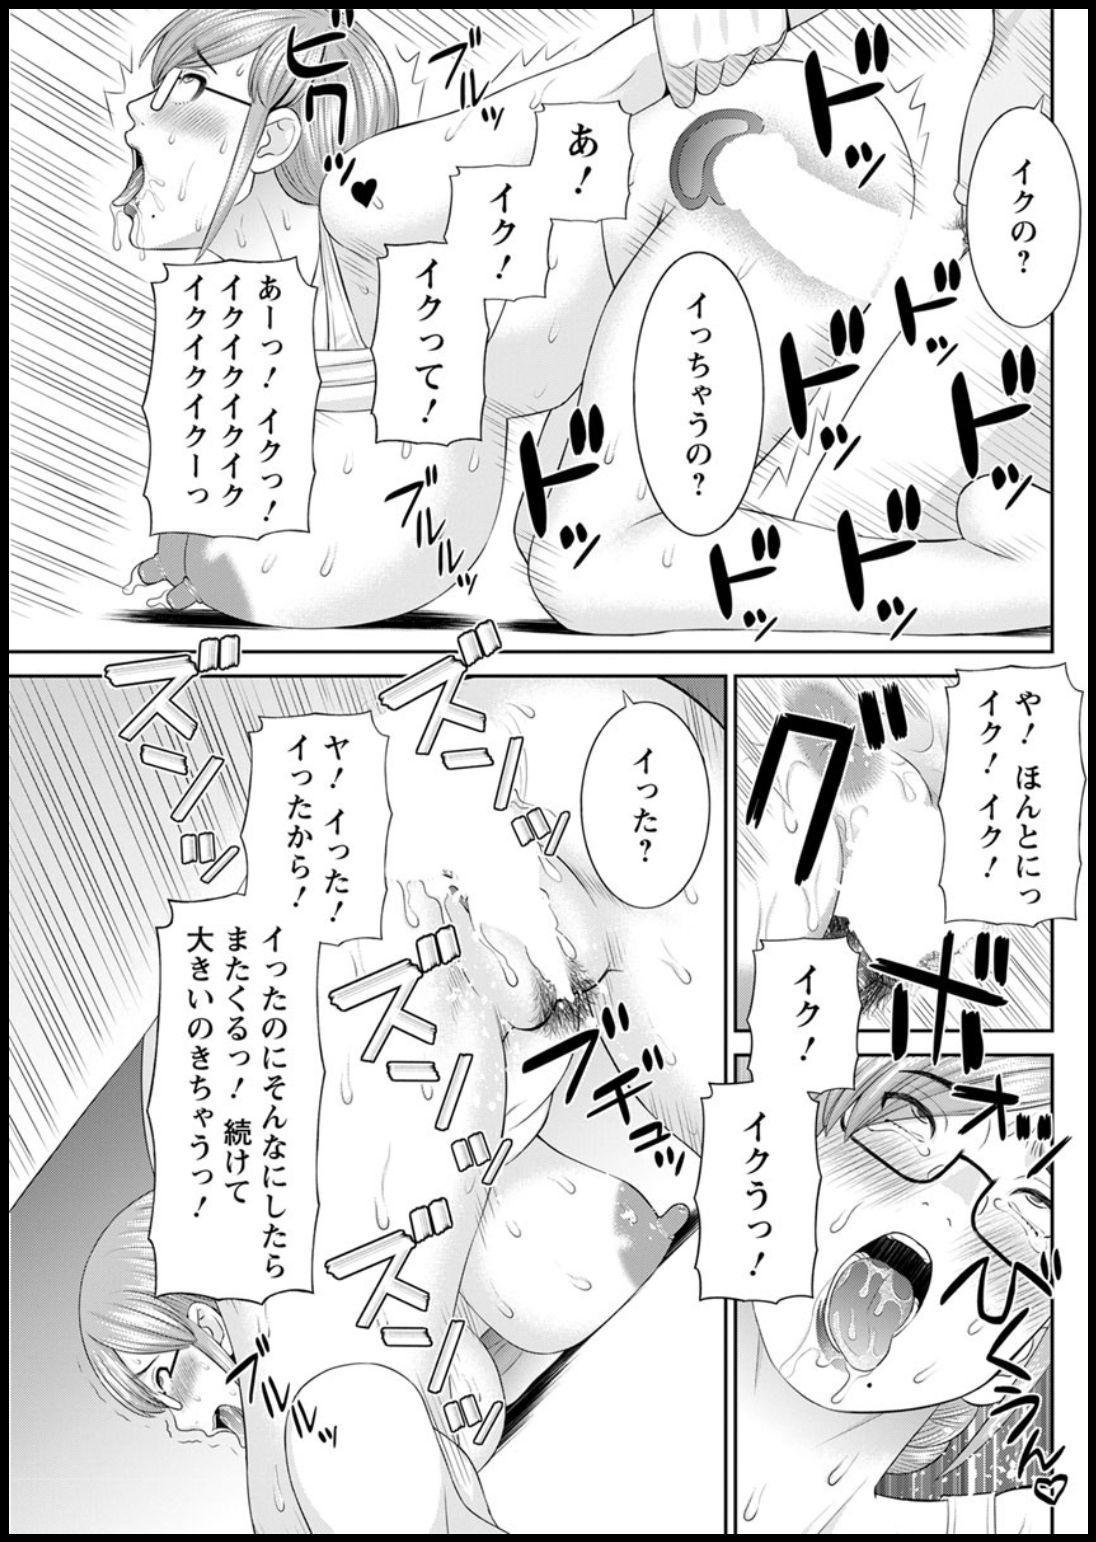 [Kawamori Misaki] Kaikan Hitotsuma Gakuen Ch. 1-6, 8-20 [Digital] 160